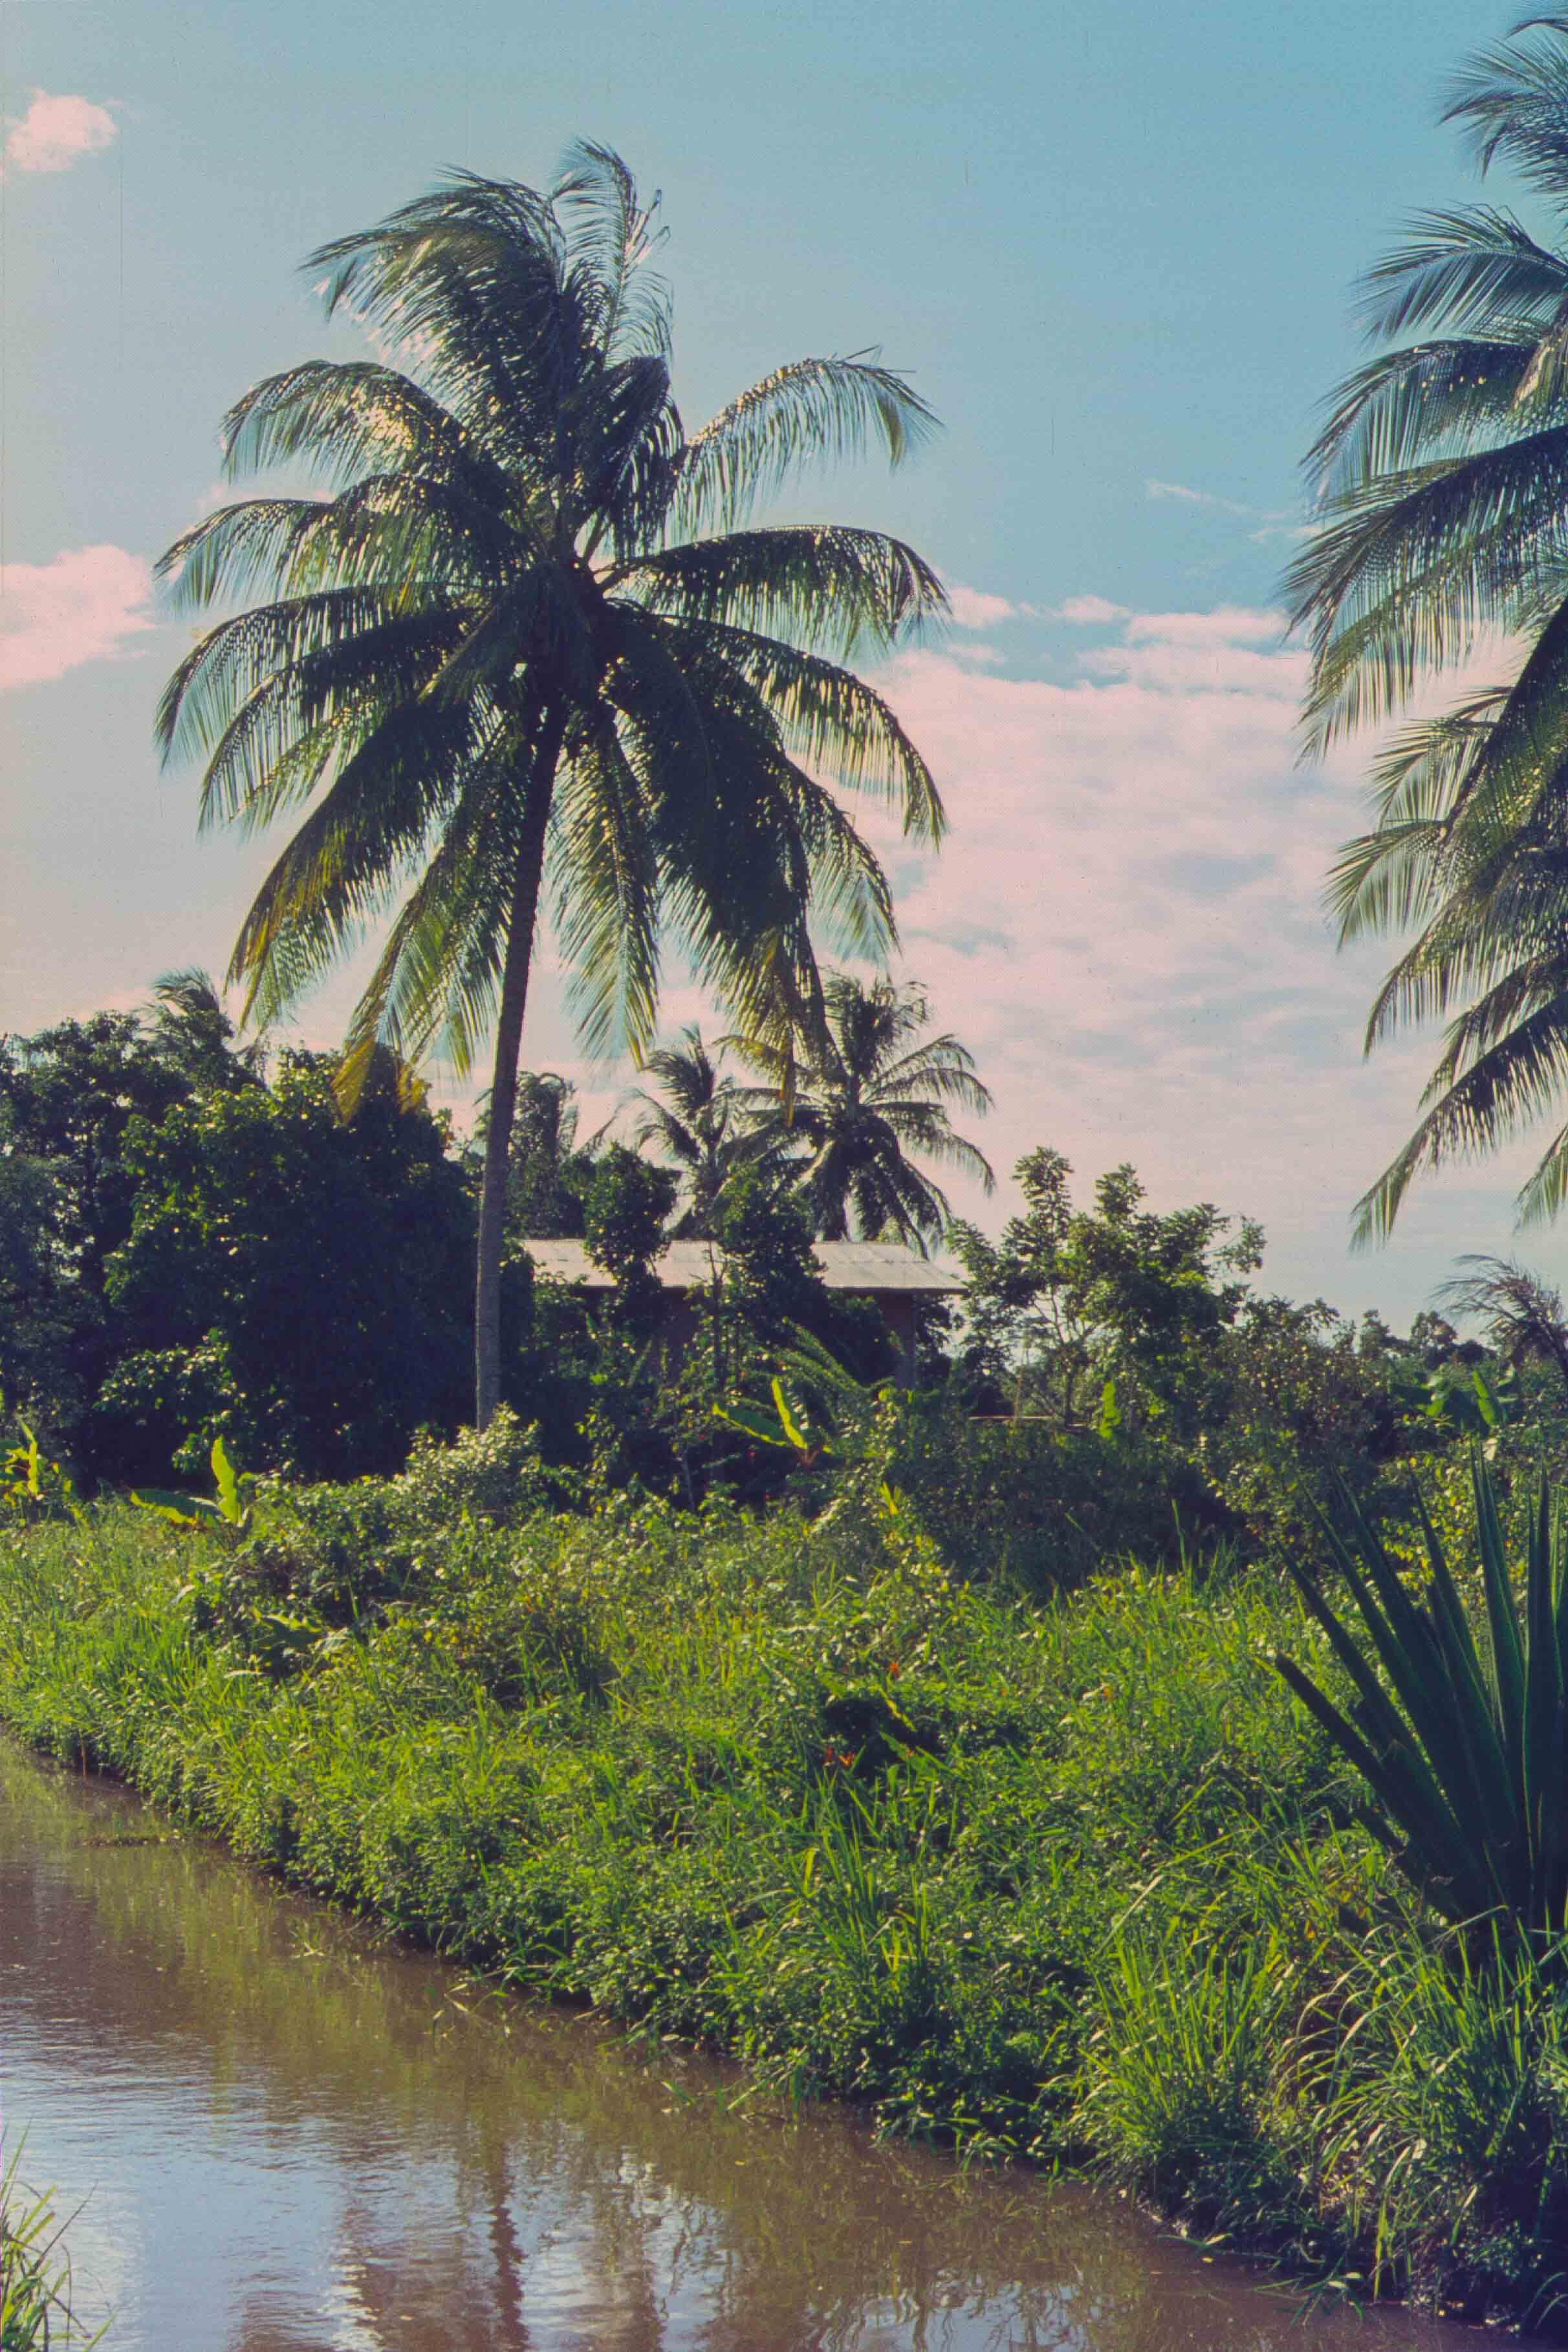 330. Suriname